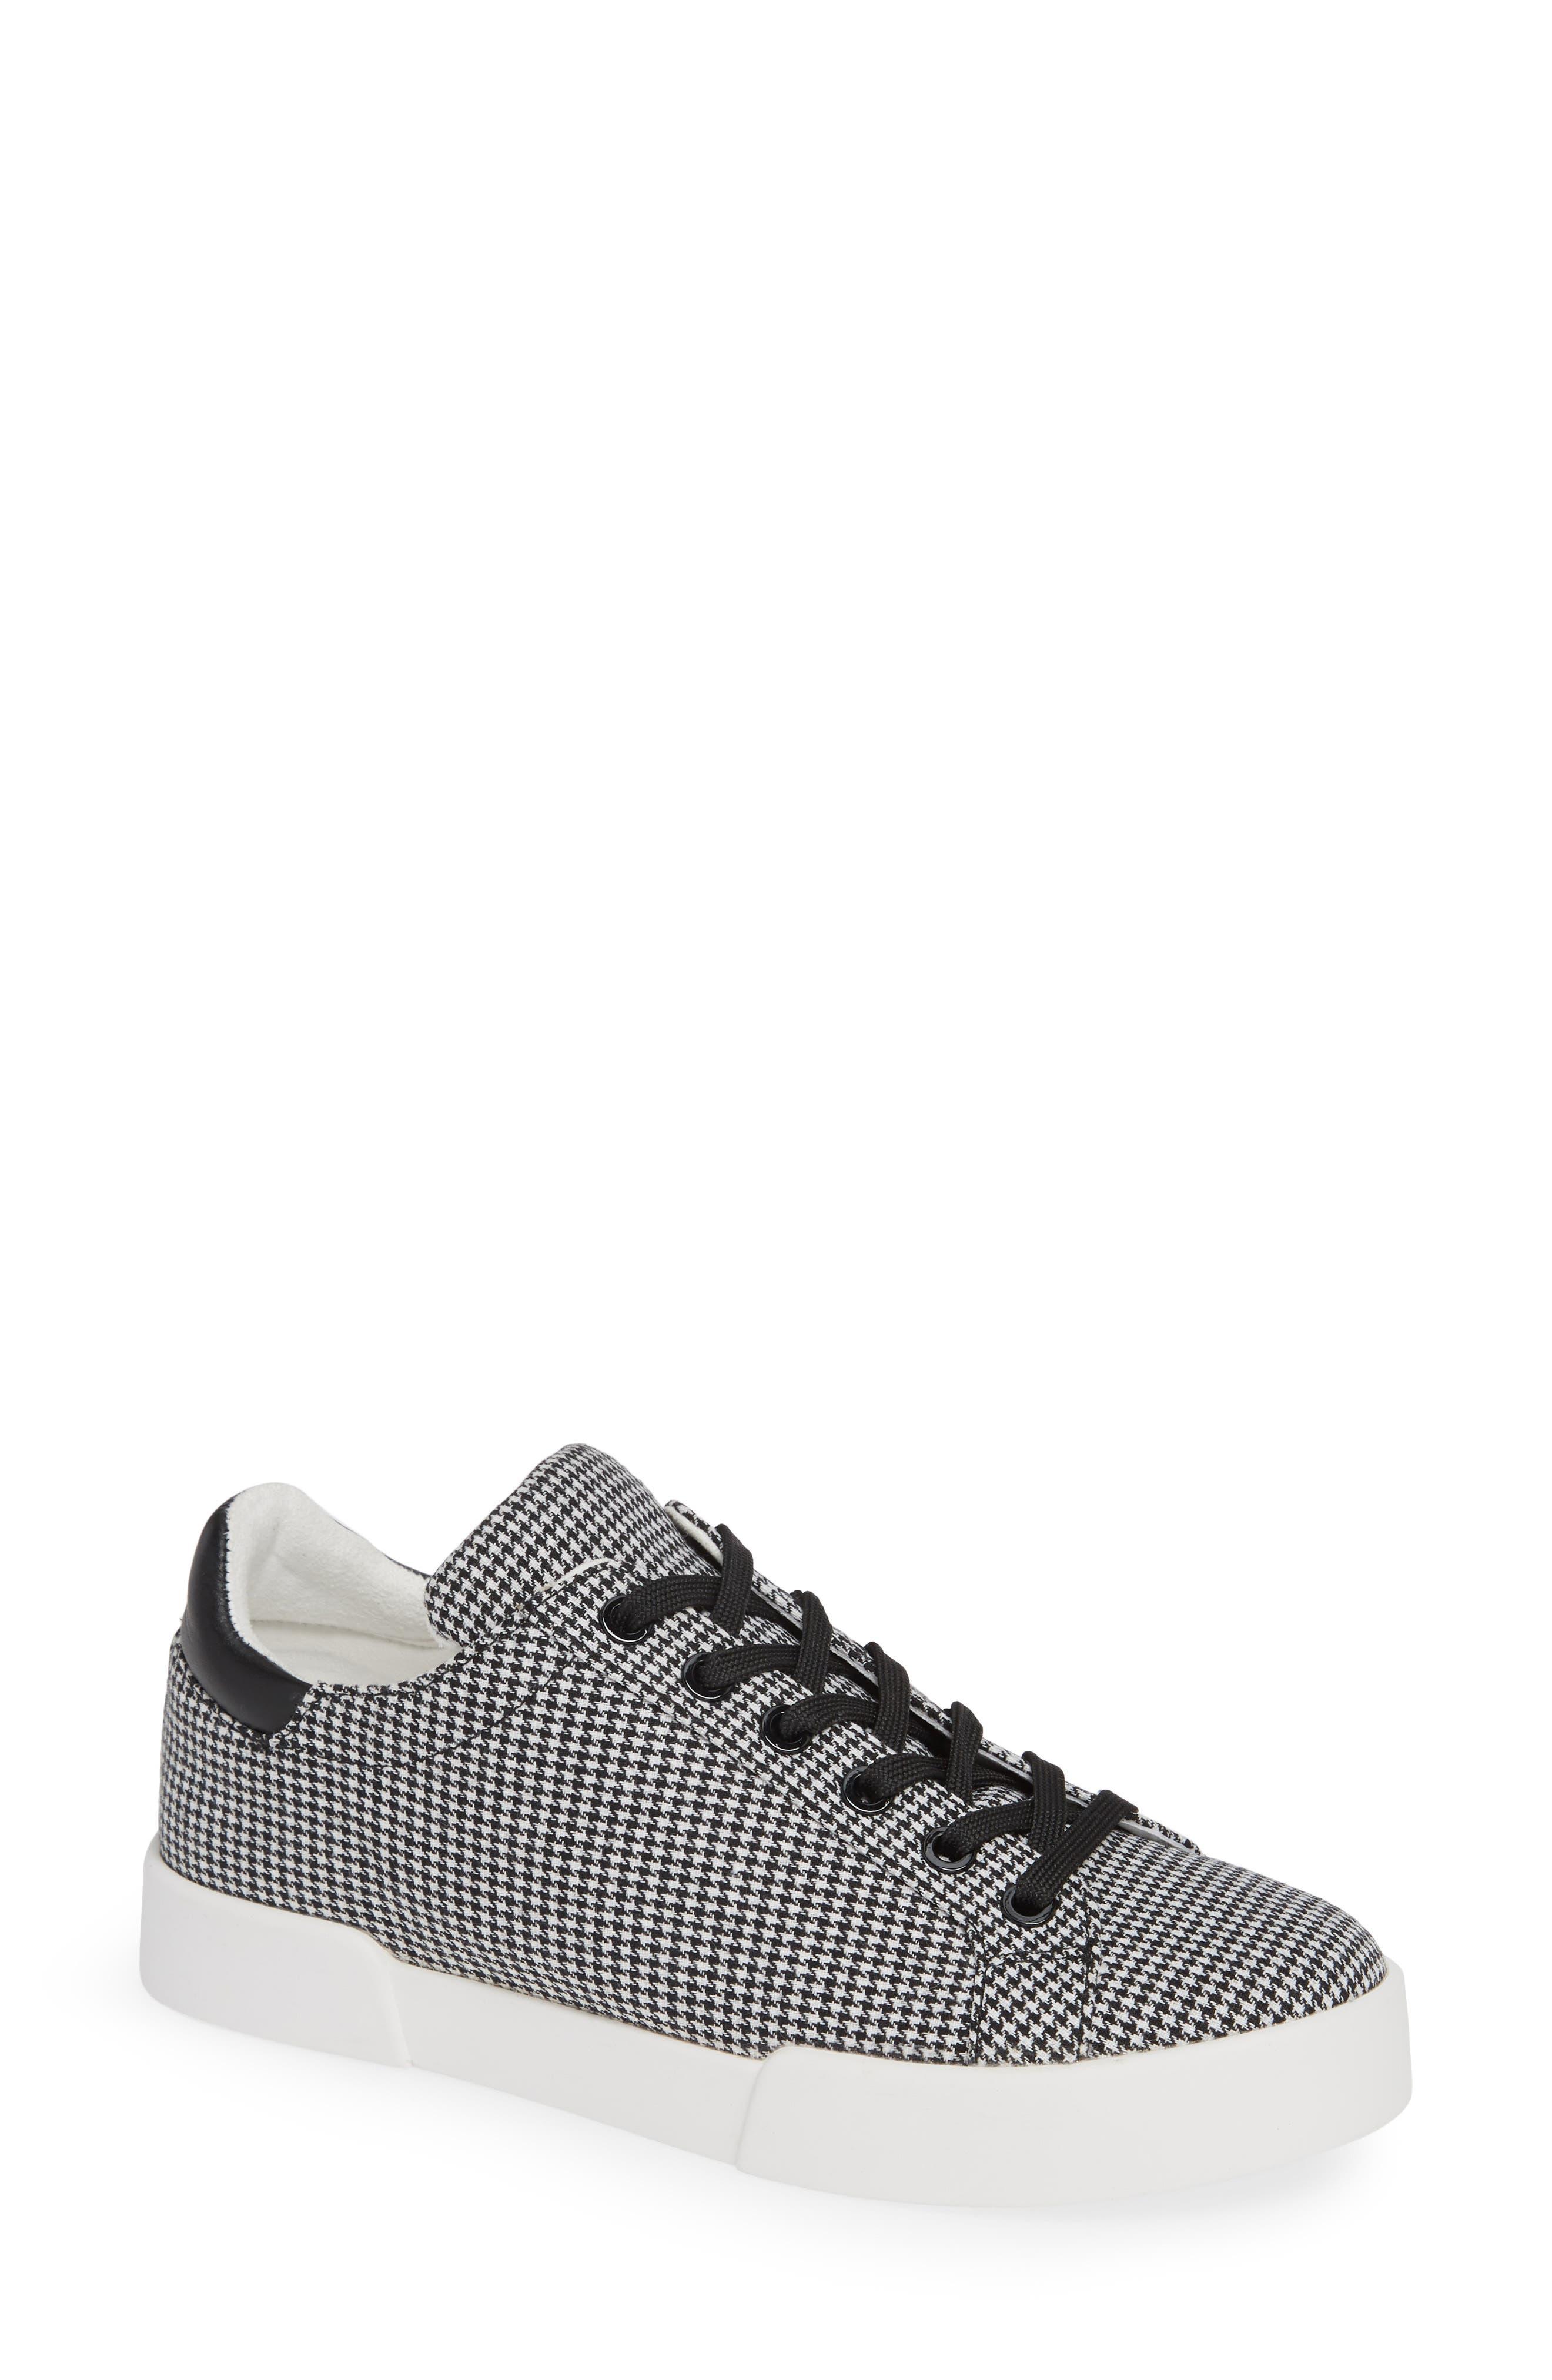 Tyler Sneaker,                             Main thumbnail 1, color,                             BLACK/ WHITE FABRIC